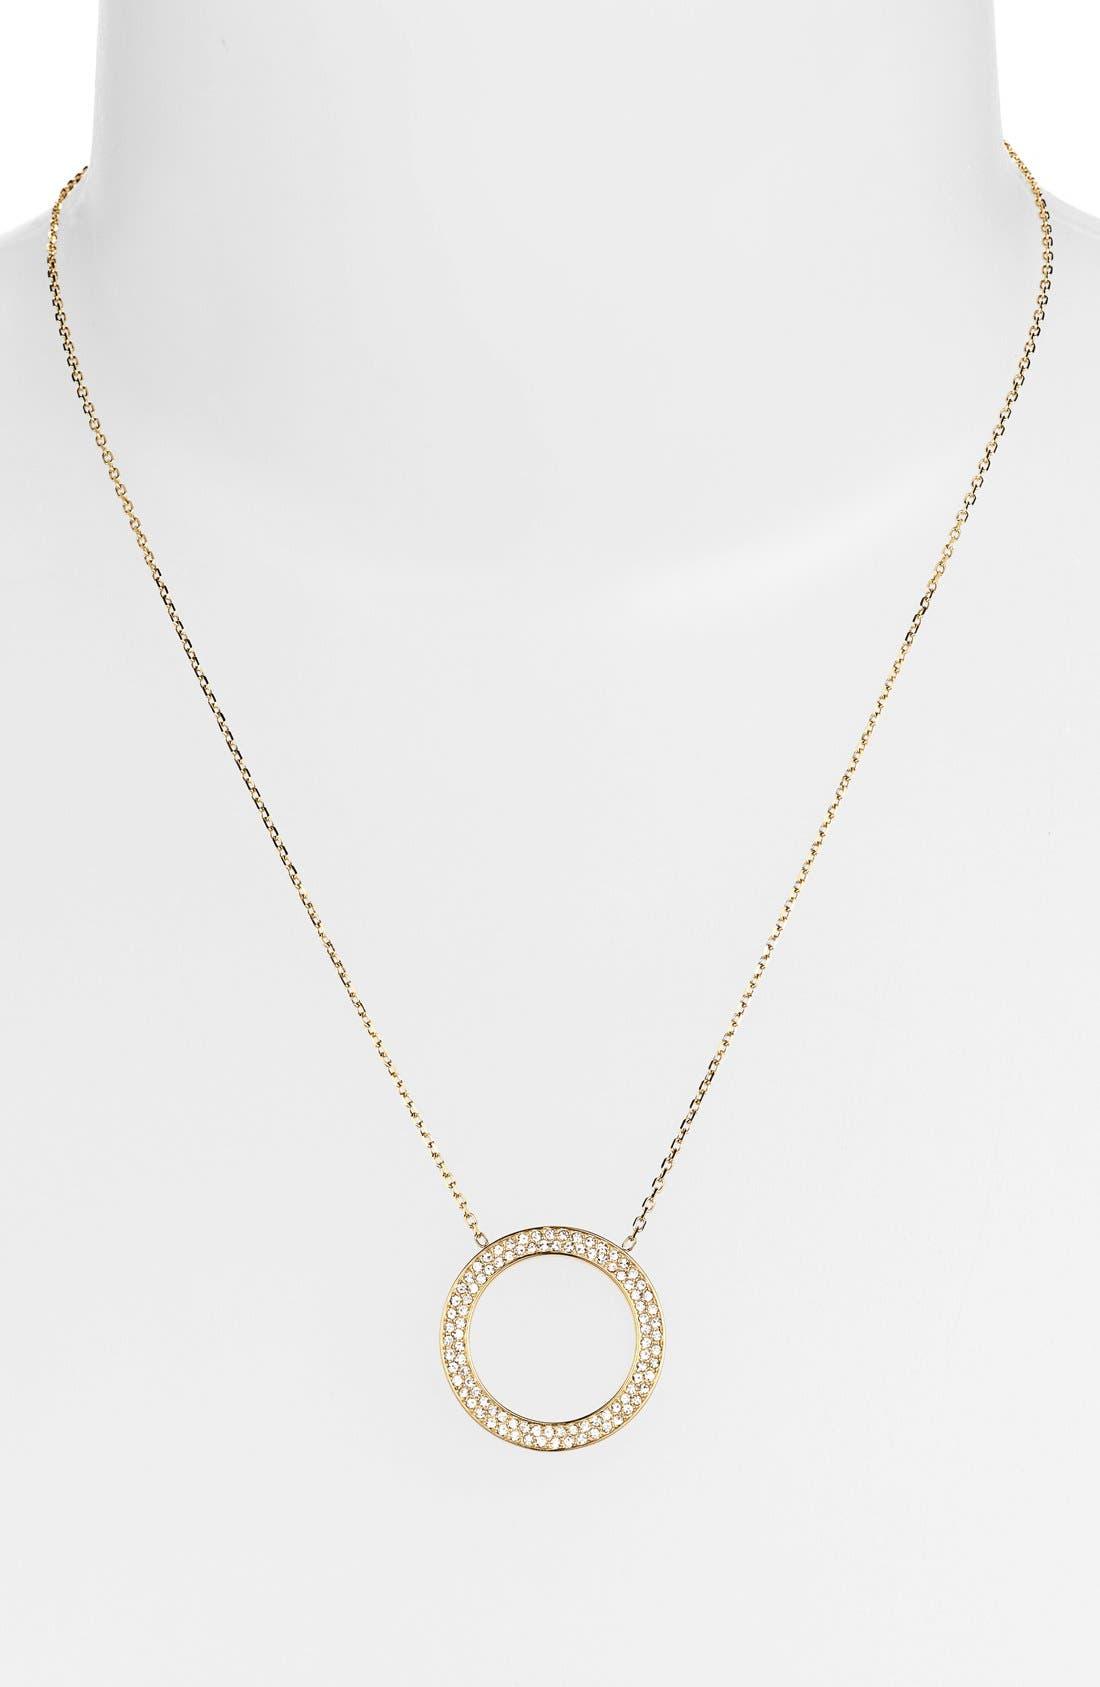 Main Image - Michael Kors 'Statement Brilliance' Circle Pendant Necklace